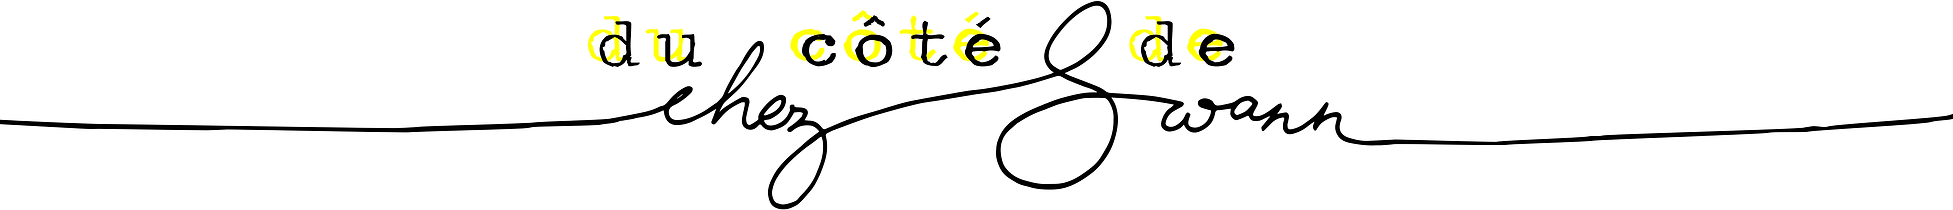 Site_blabla.png